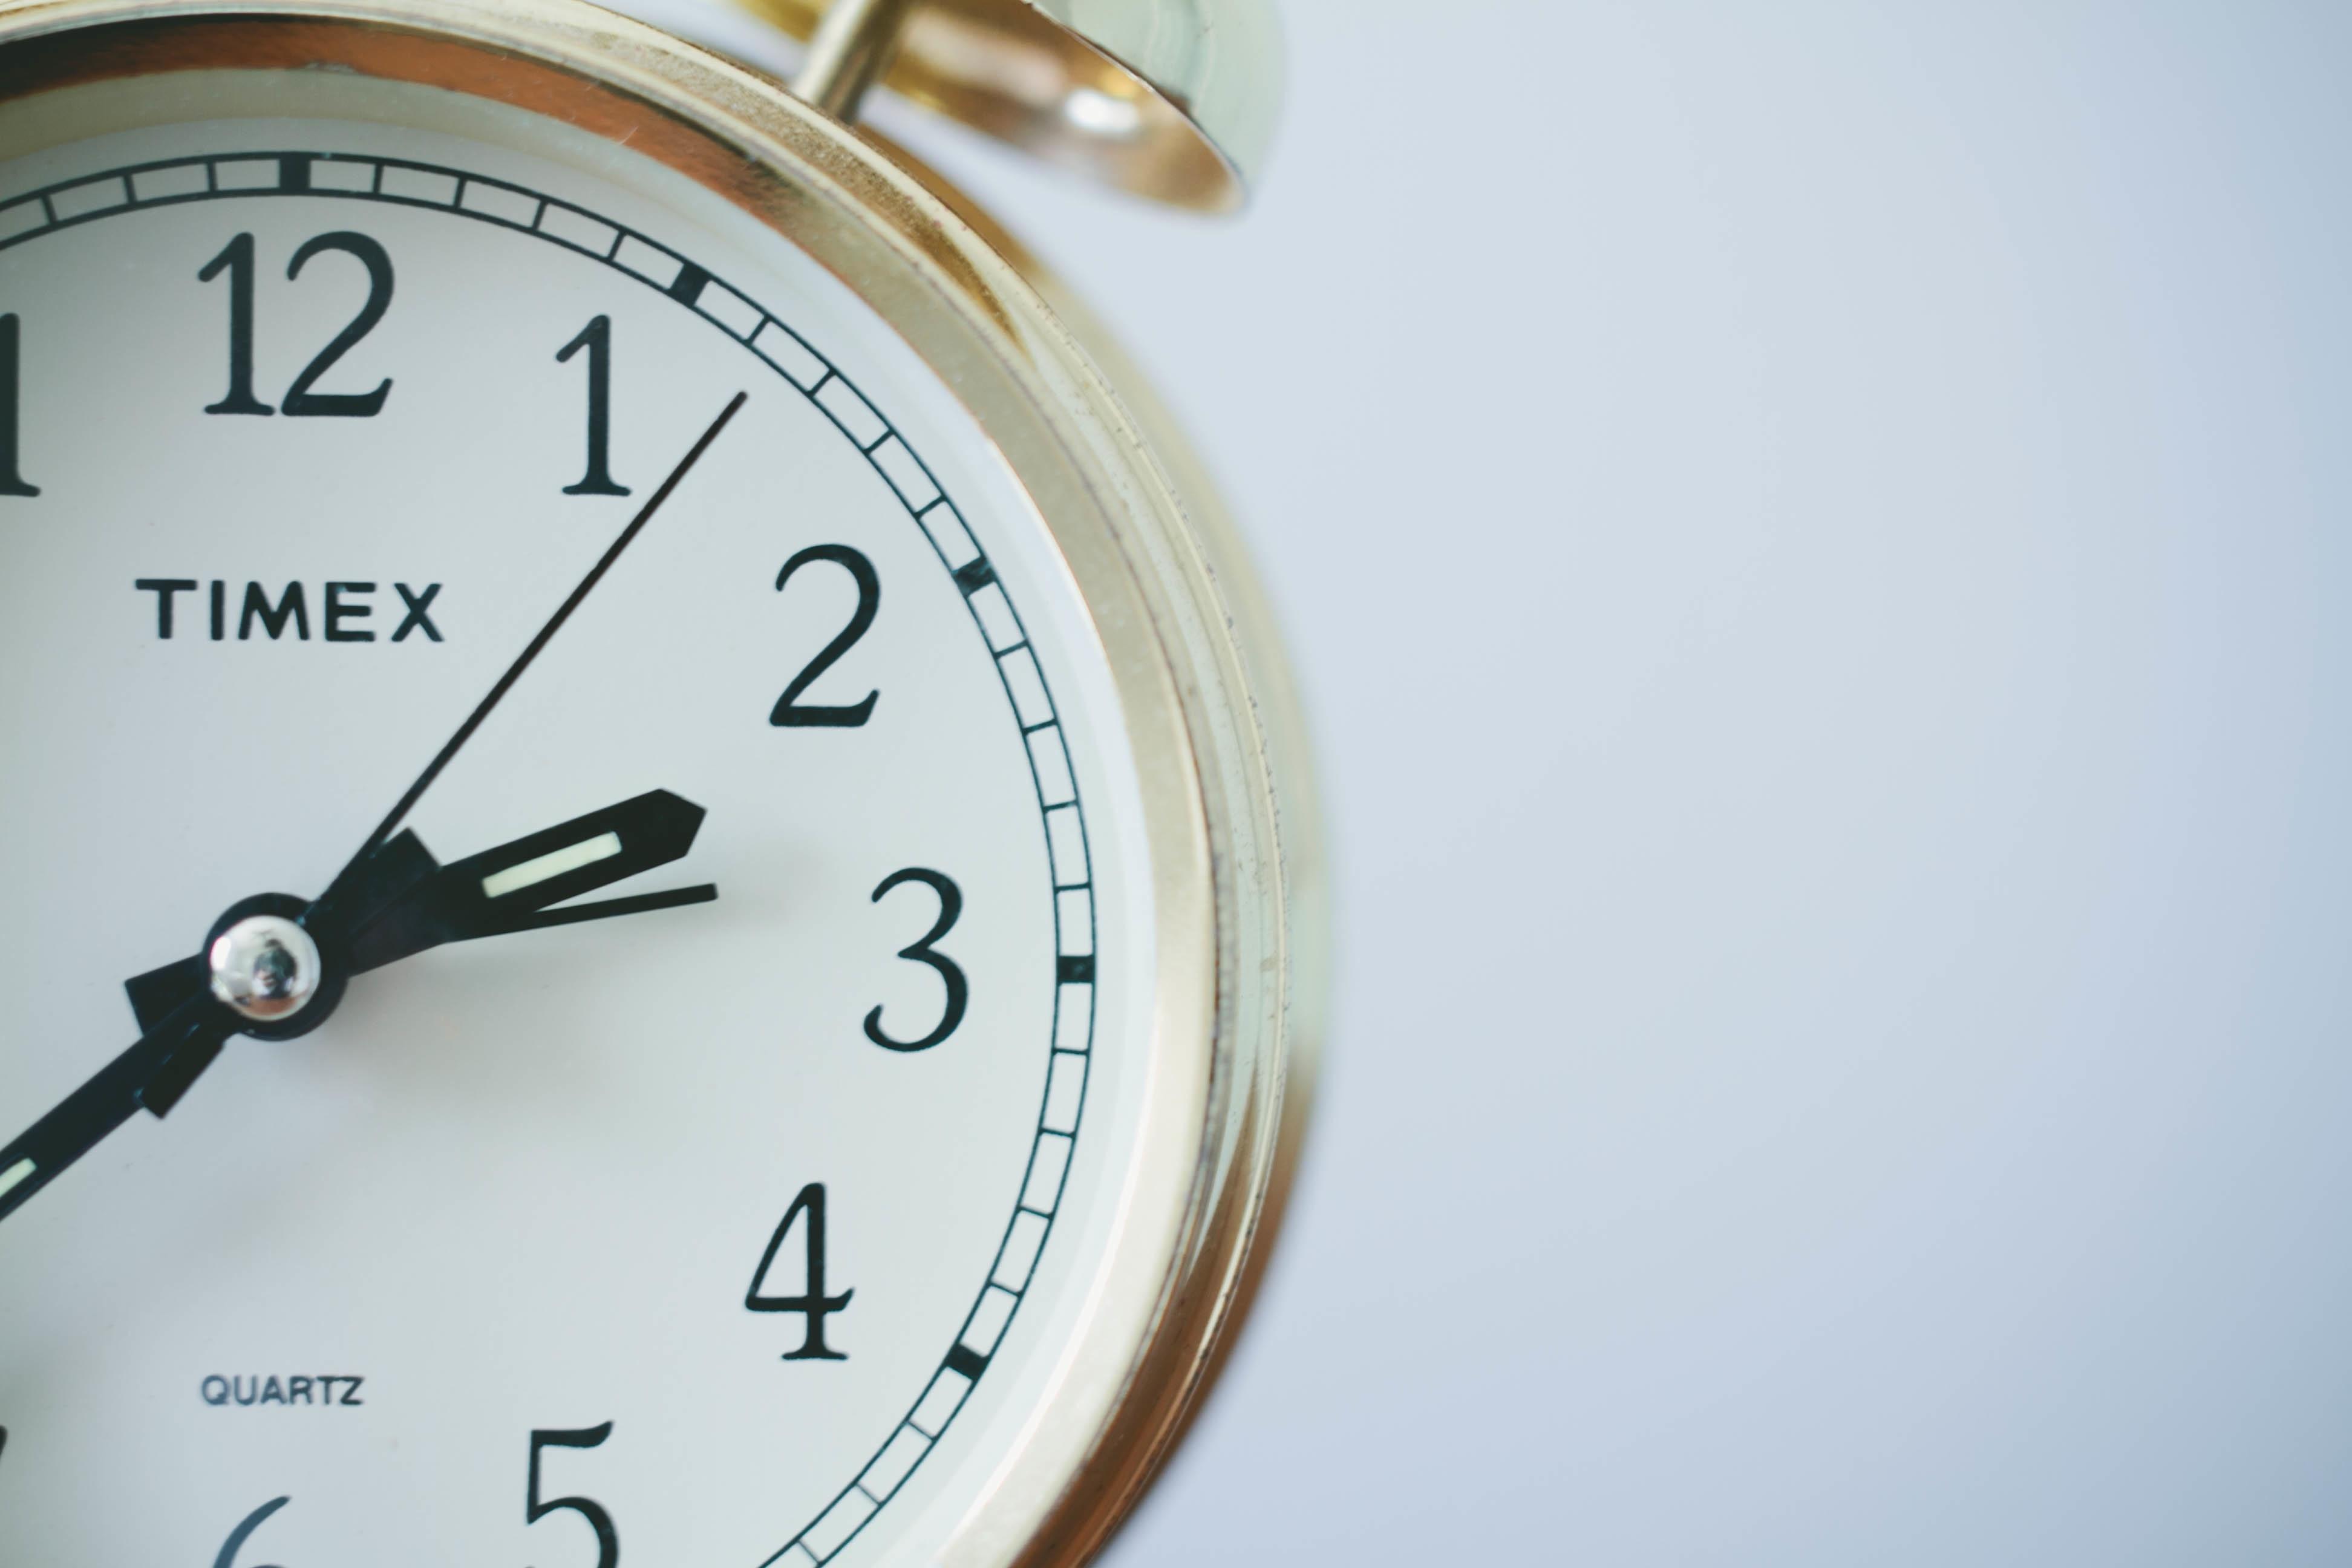 Clock by Sonja Langford via unsplash.com (https://unsplash.com/photos/eIkbSc3SDtI)